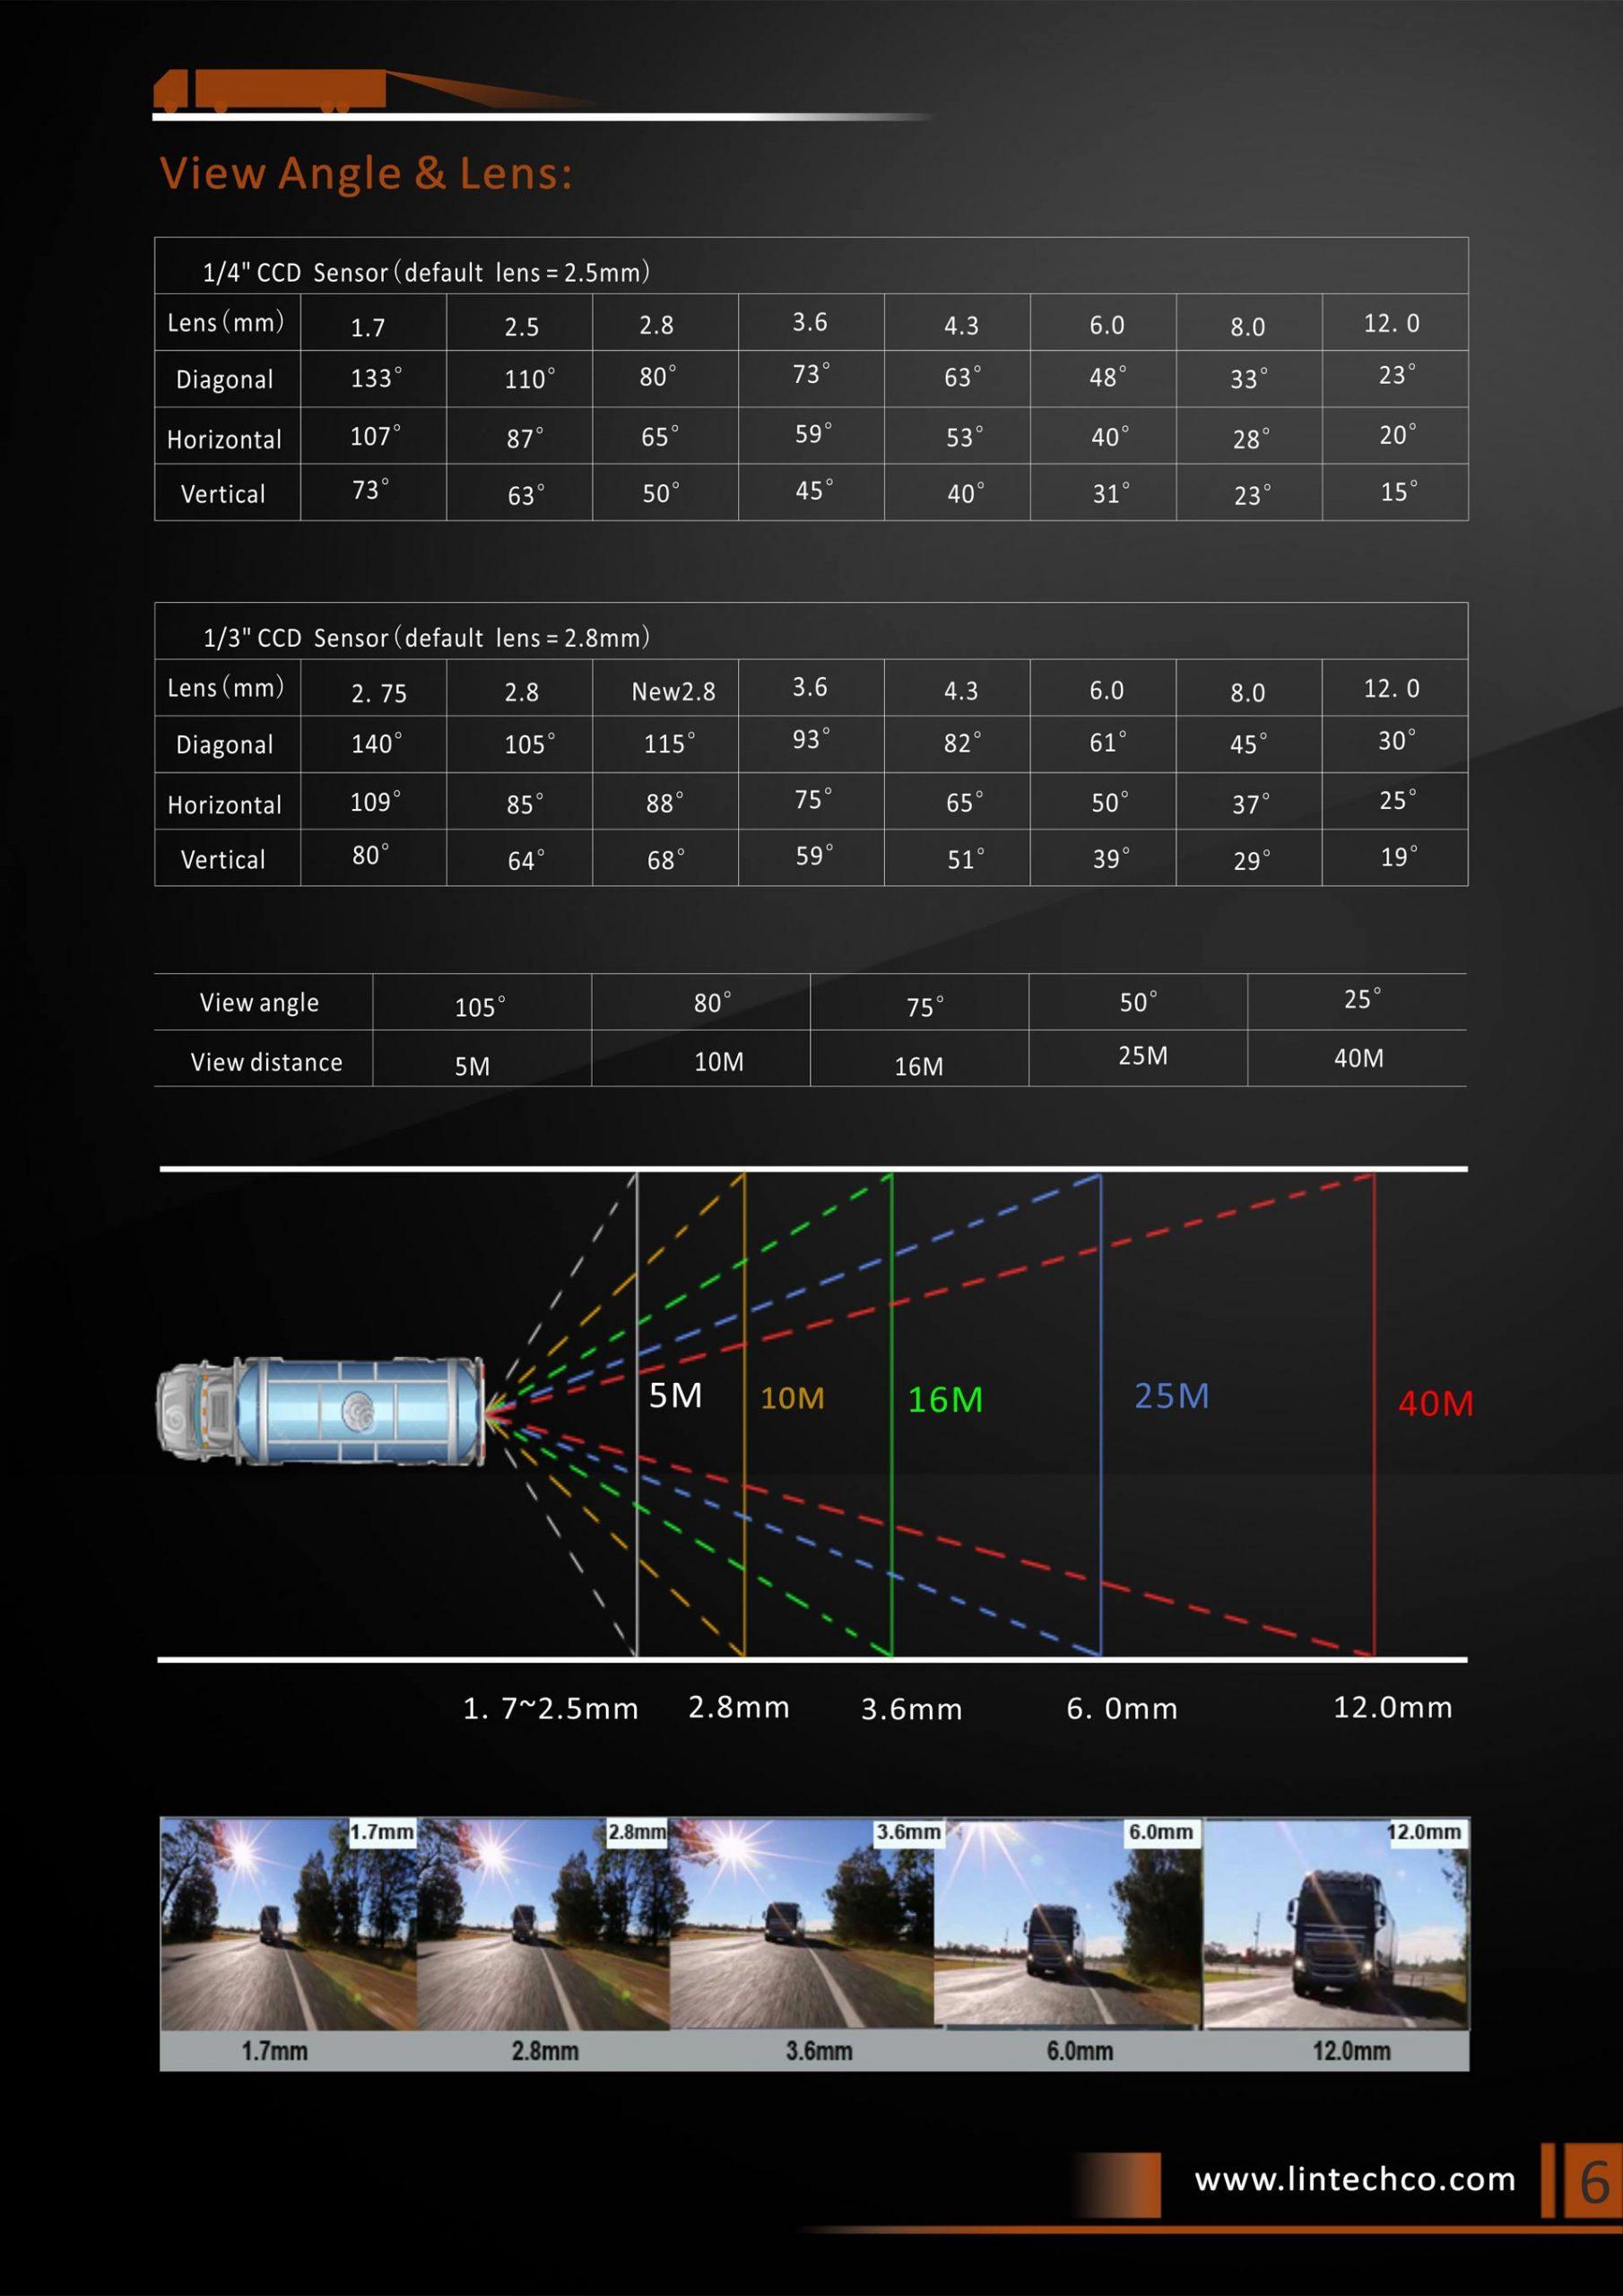 6.Heavy-Duty-18pcs-IR-LED-Night-Vision-IP69K-Waterproof-Backup-Camera